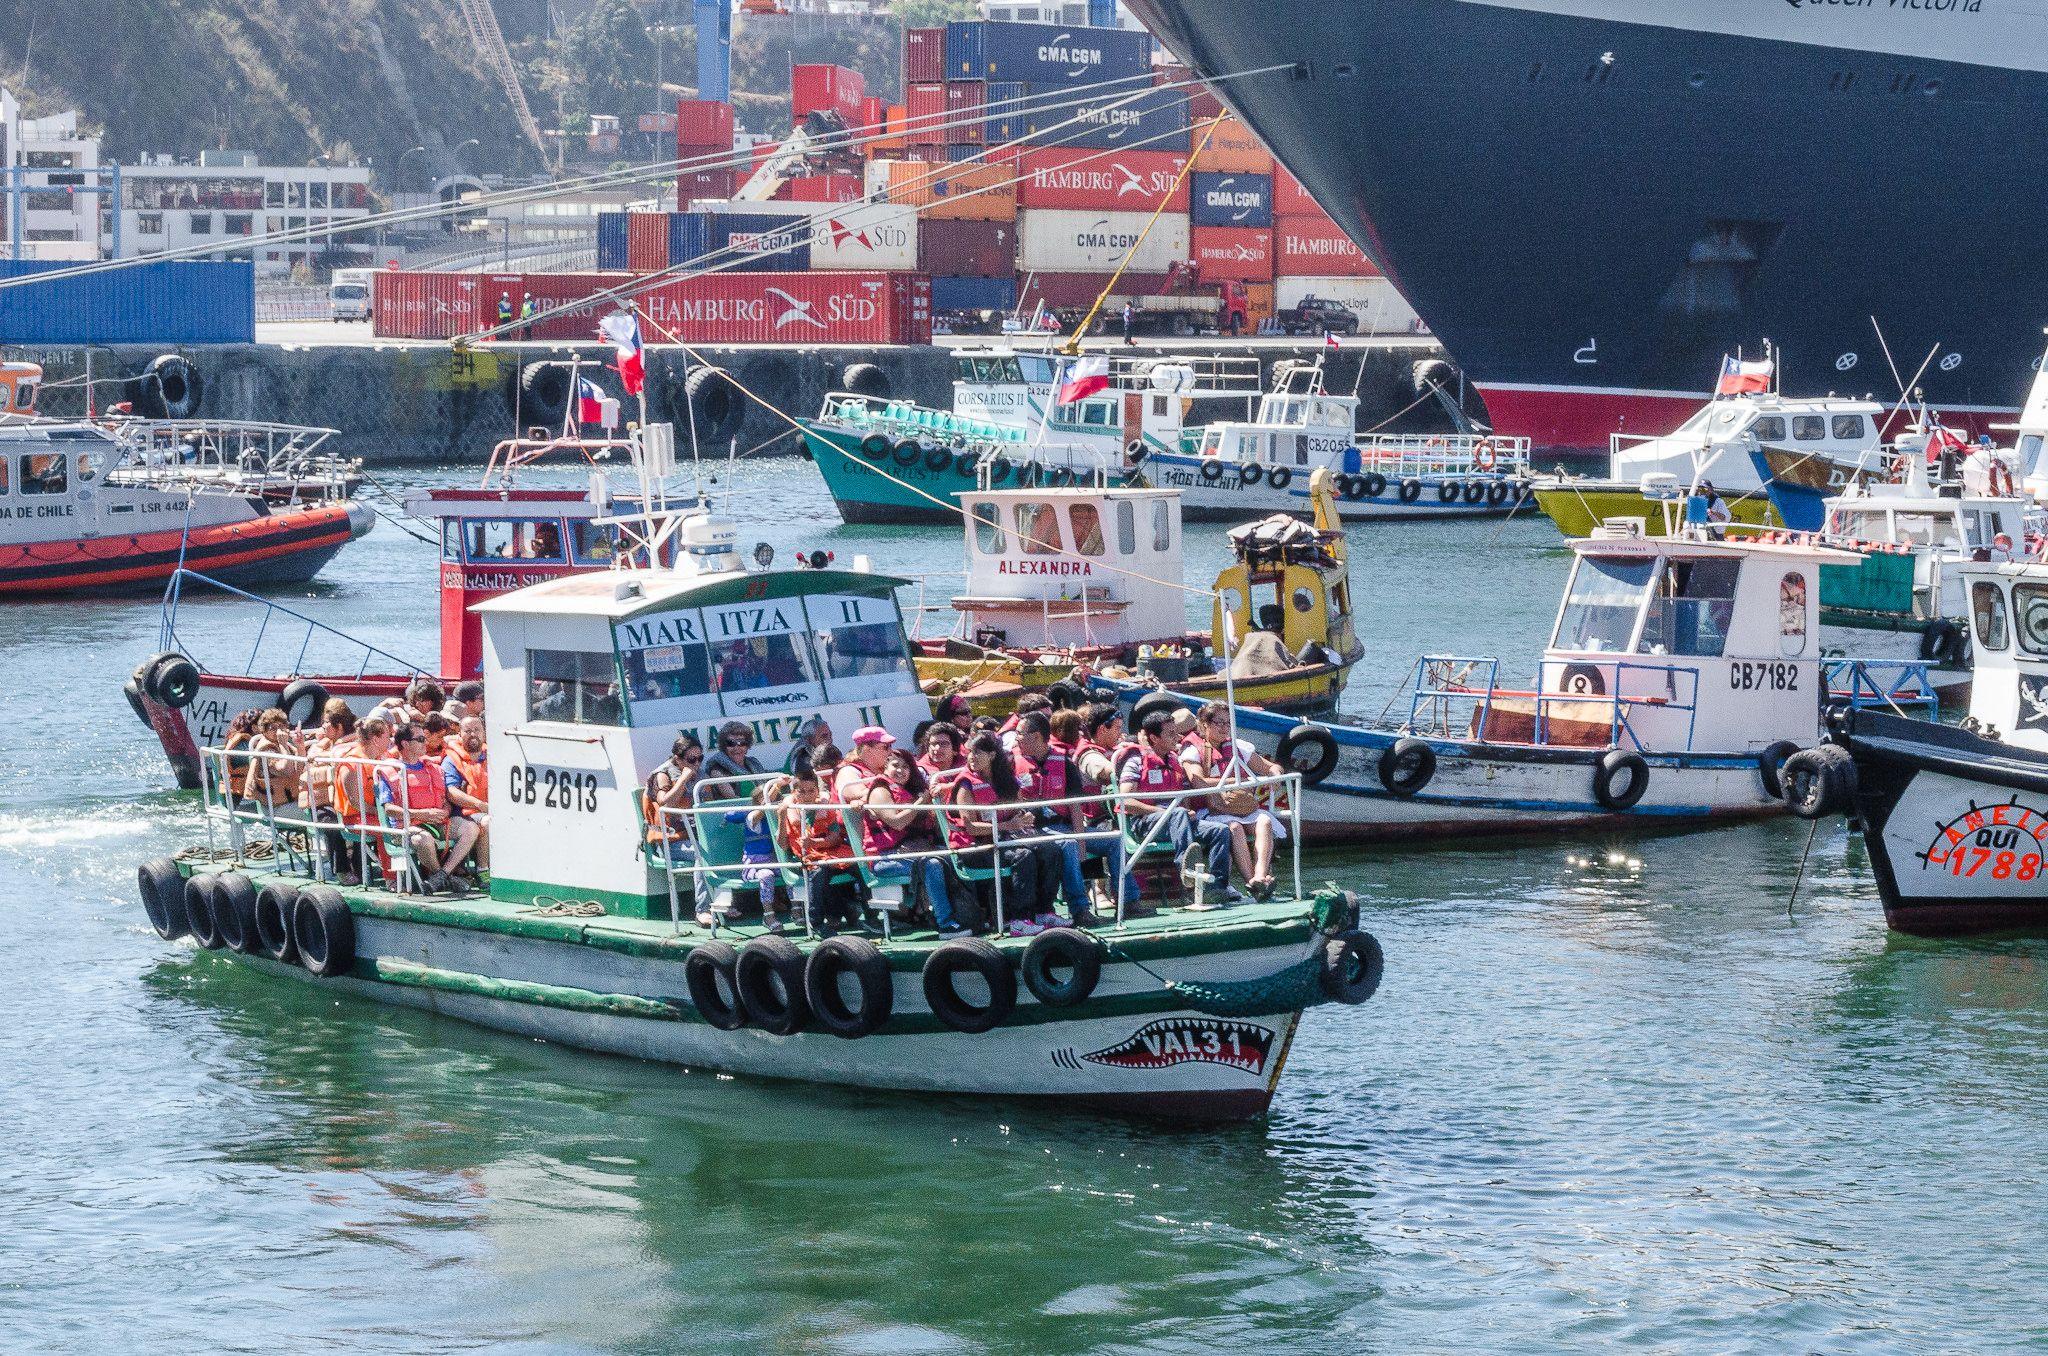 https://flic.kr/p/wMTDnD   Valparaíso   Puerto de Valparaíso